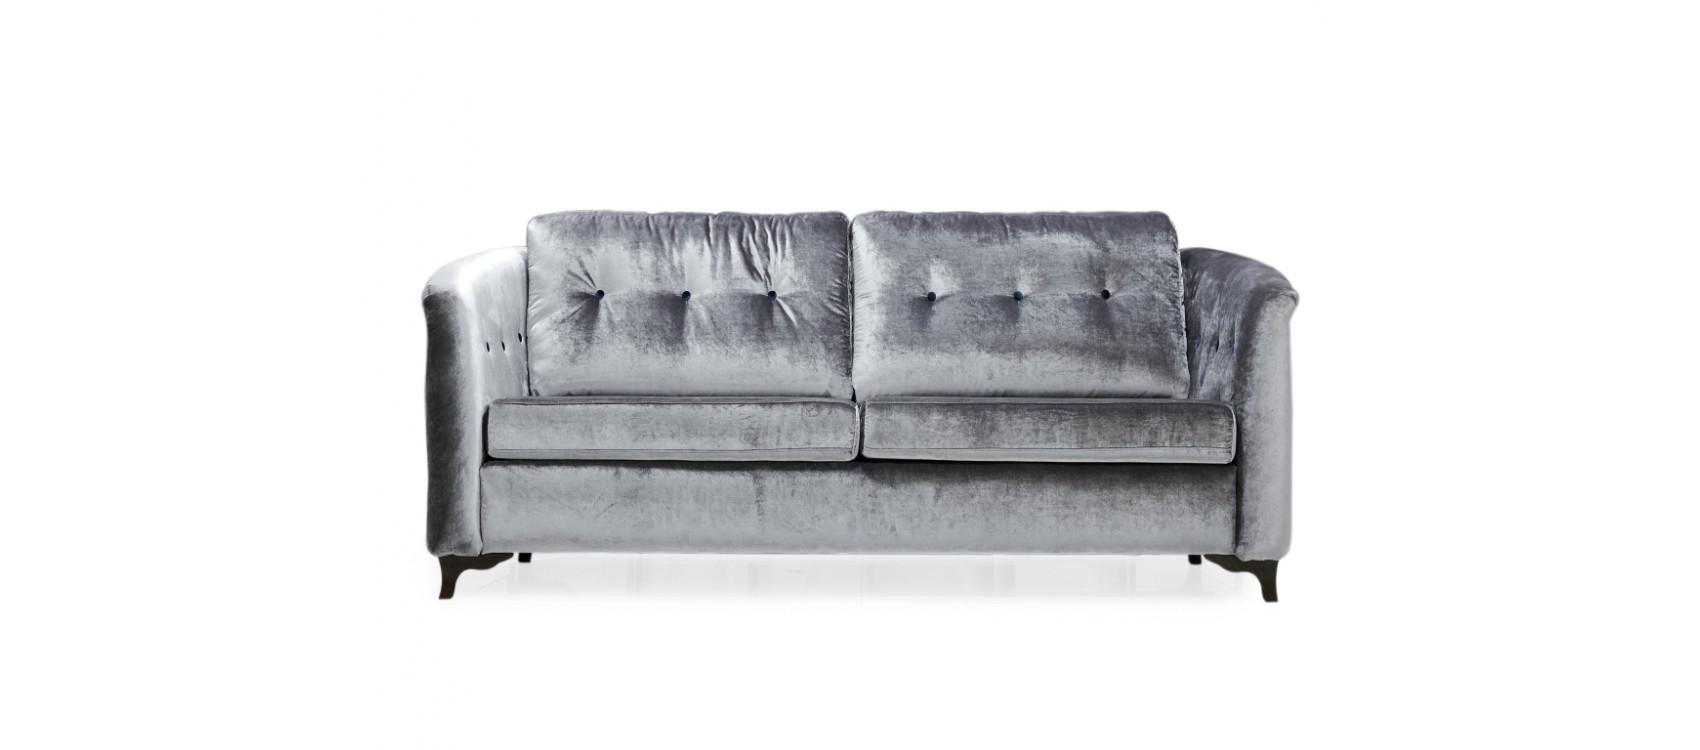 Sofa MAXBURG фото 8